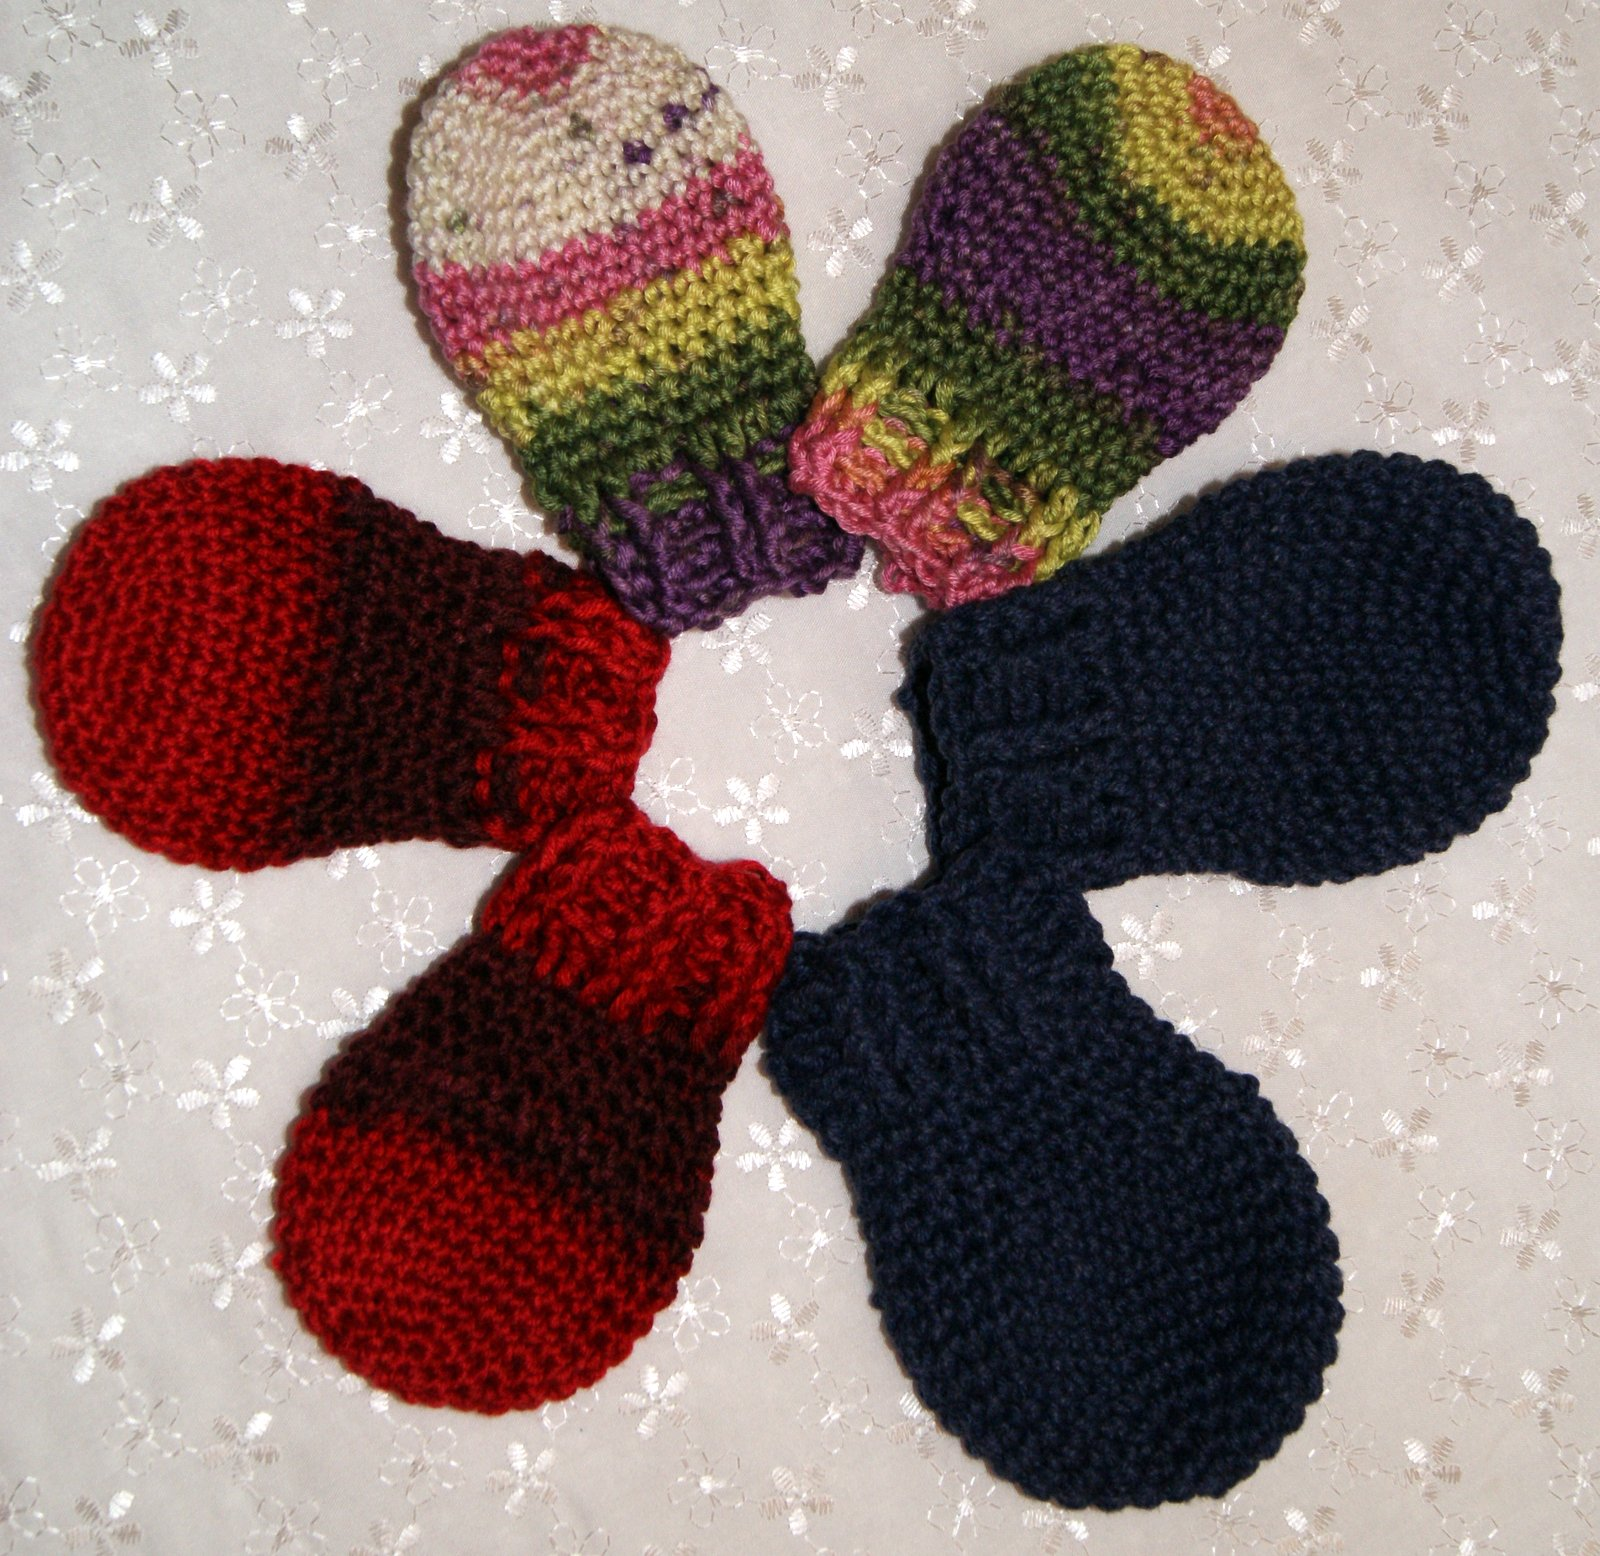 Crochet Thumbless Mitten Pattern | Stitch4eveR